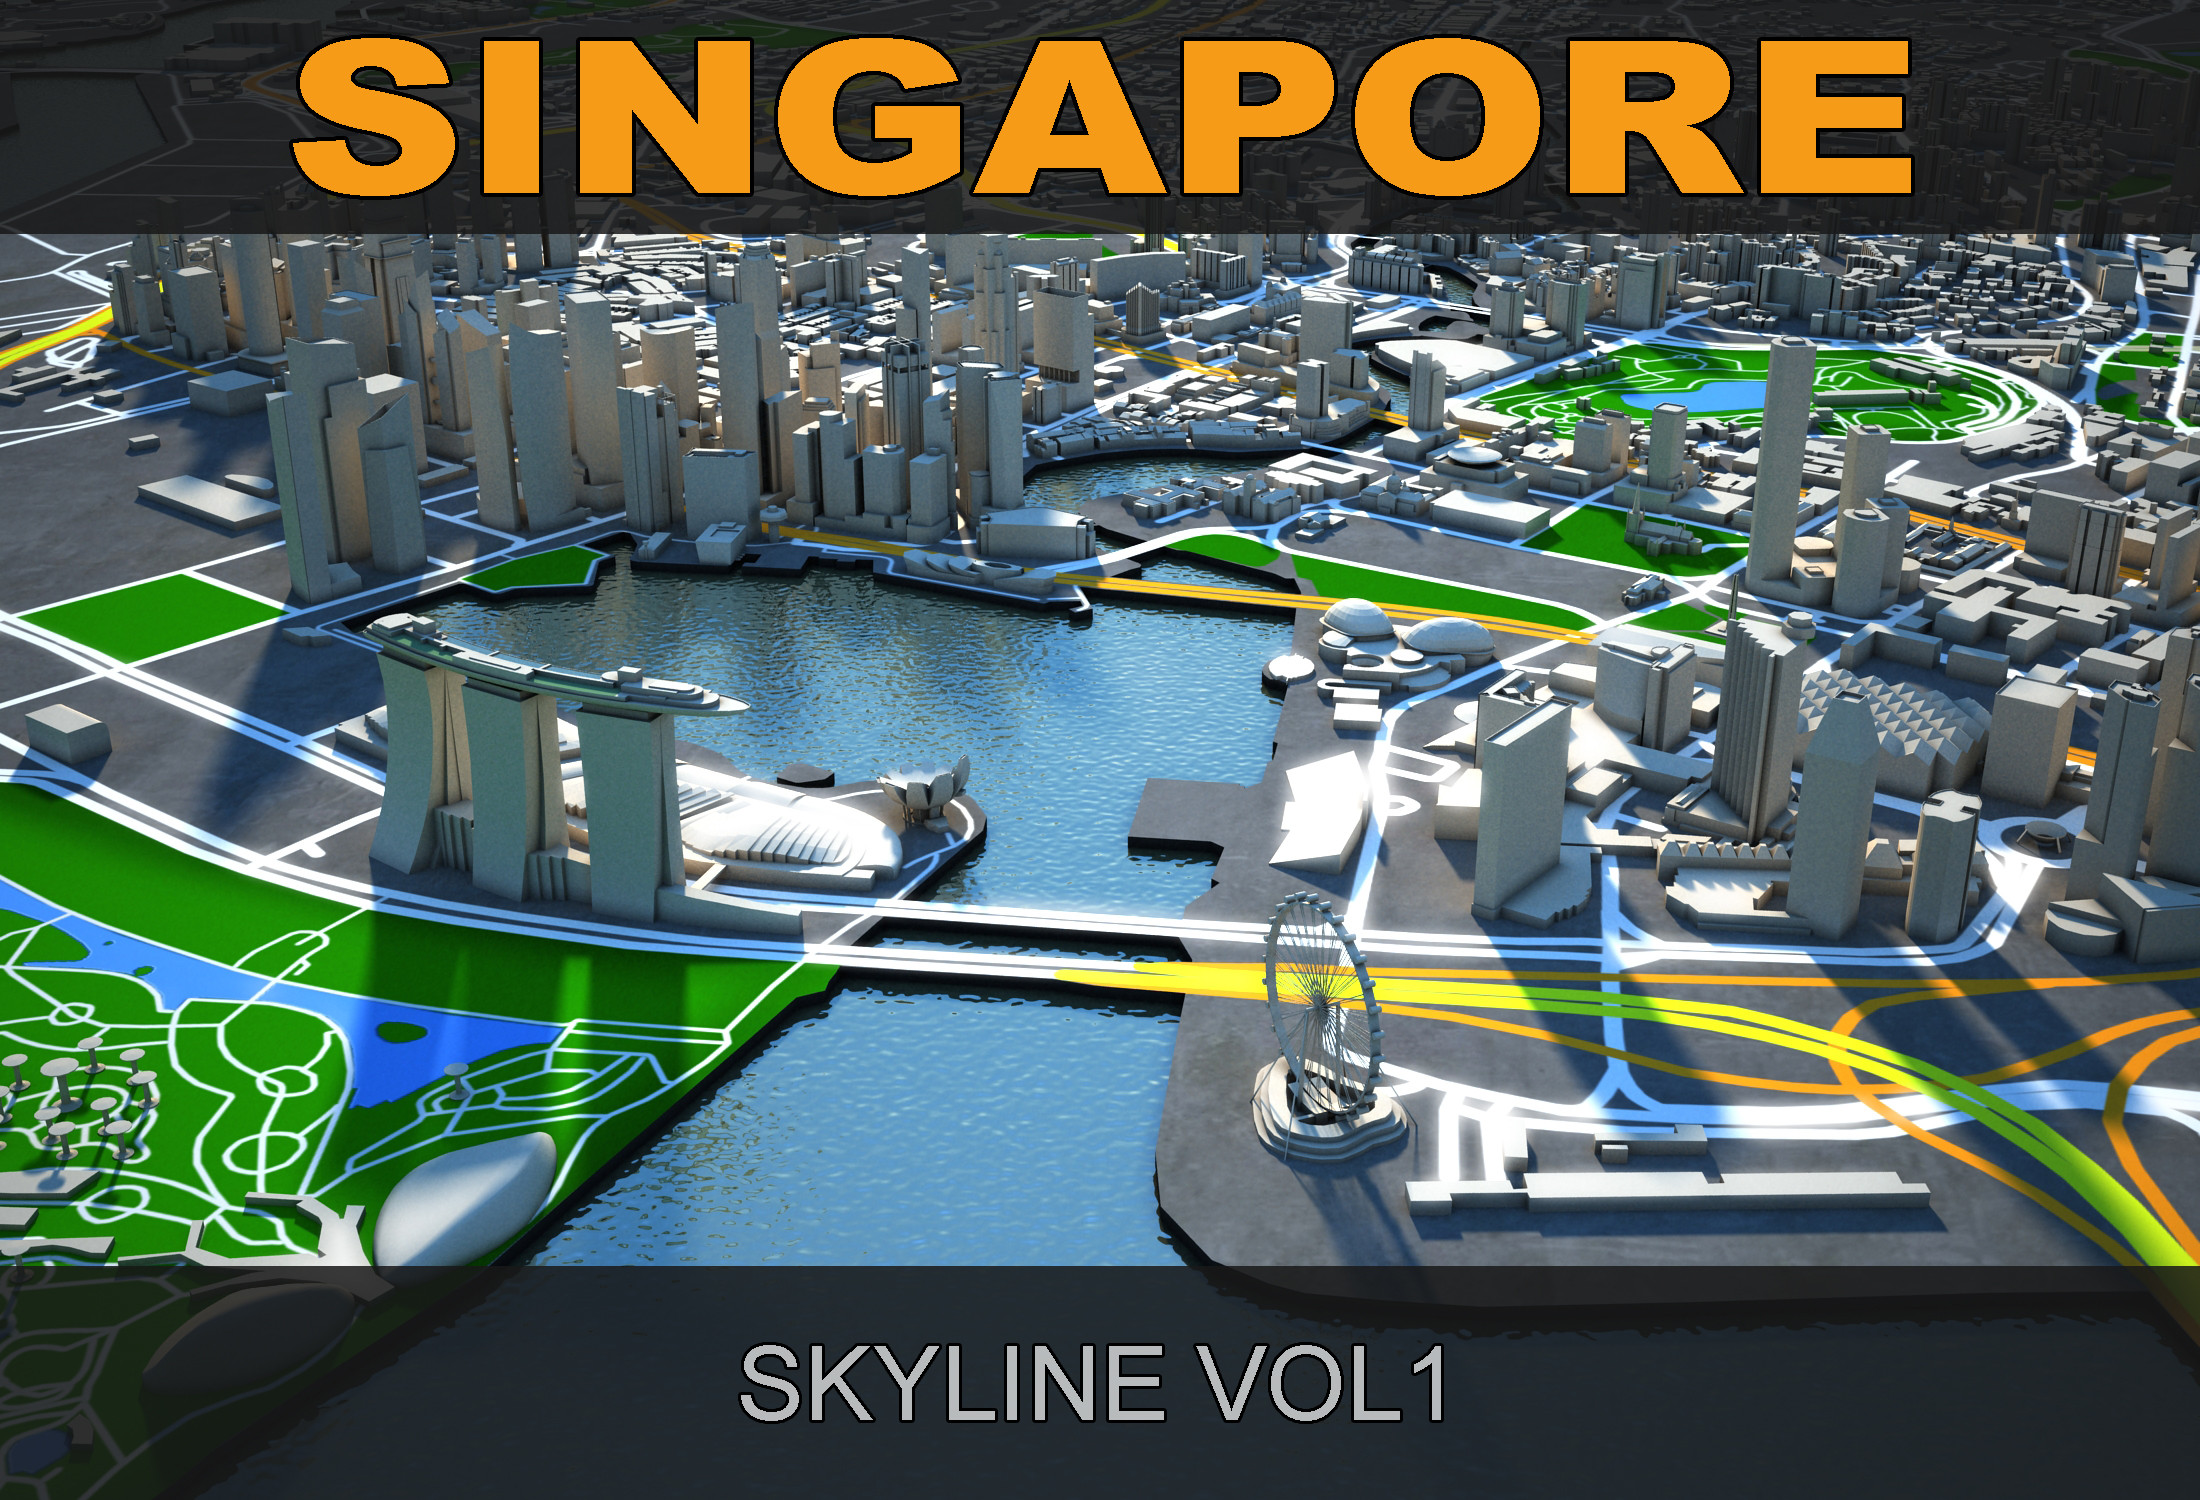 singapore_skyline_render_01.jpg